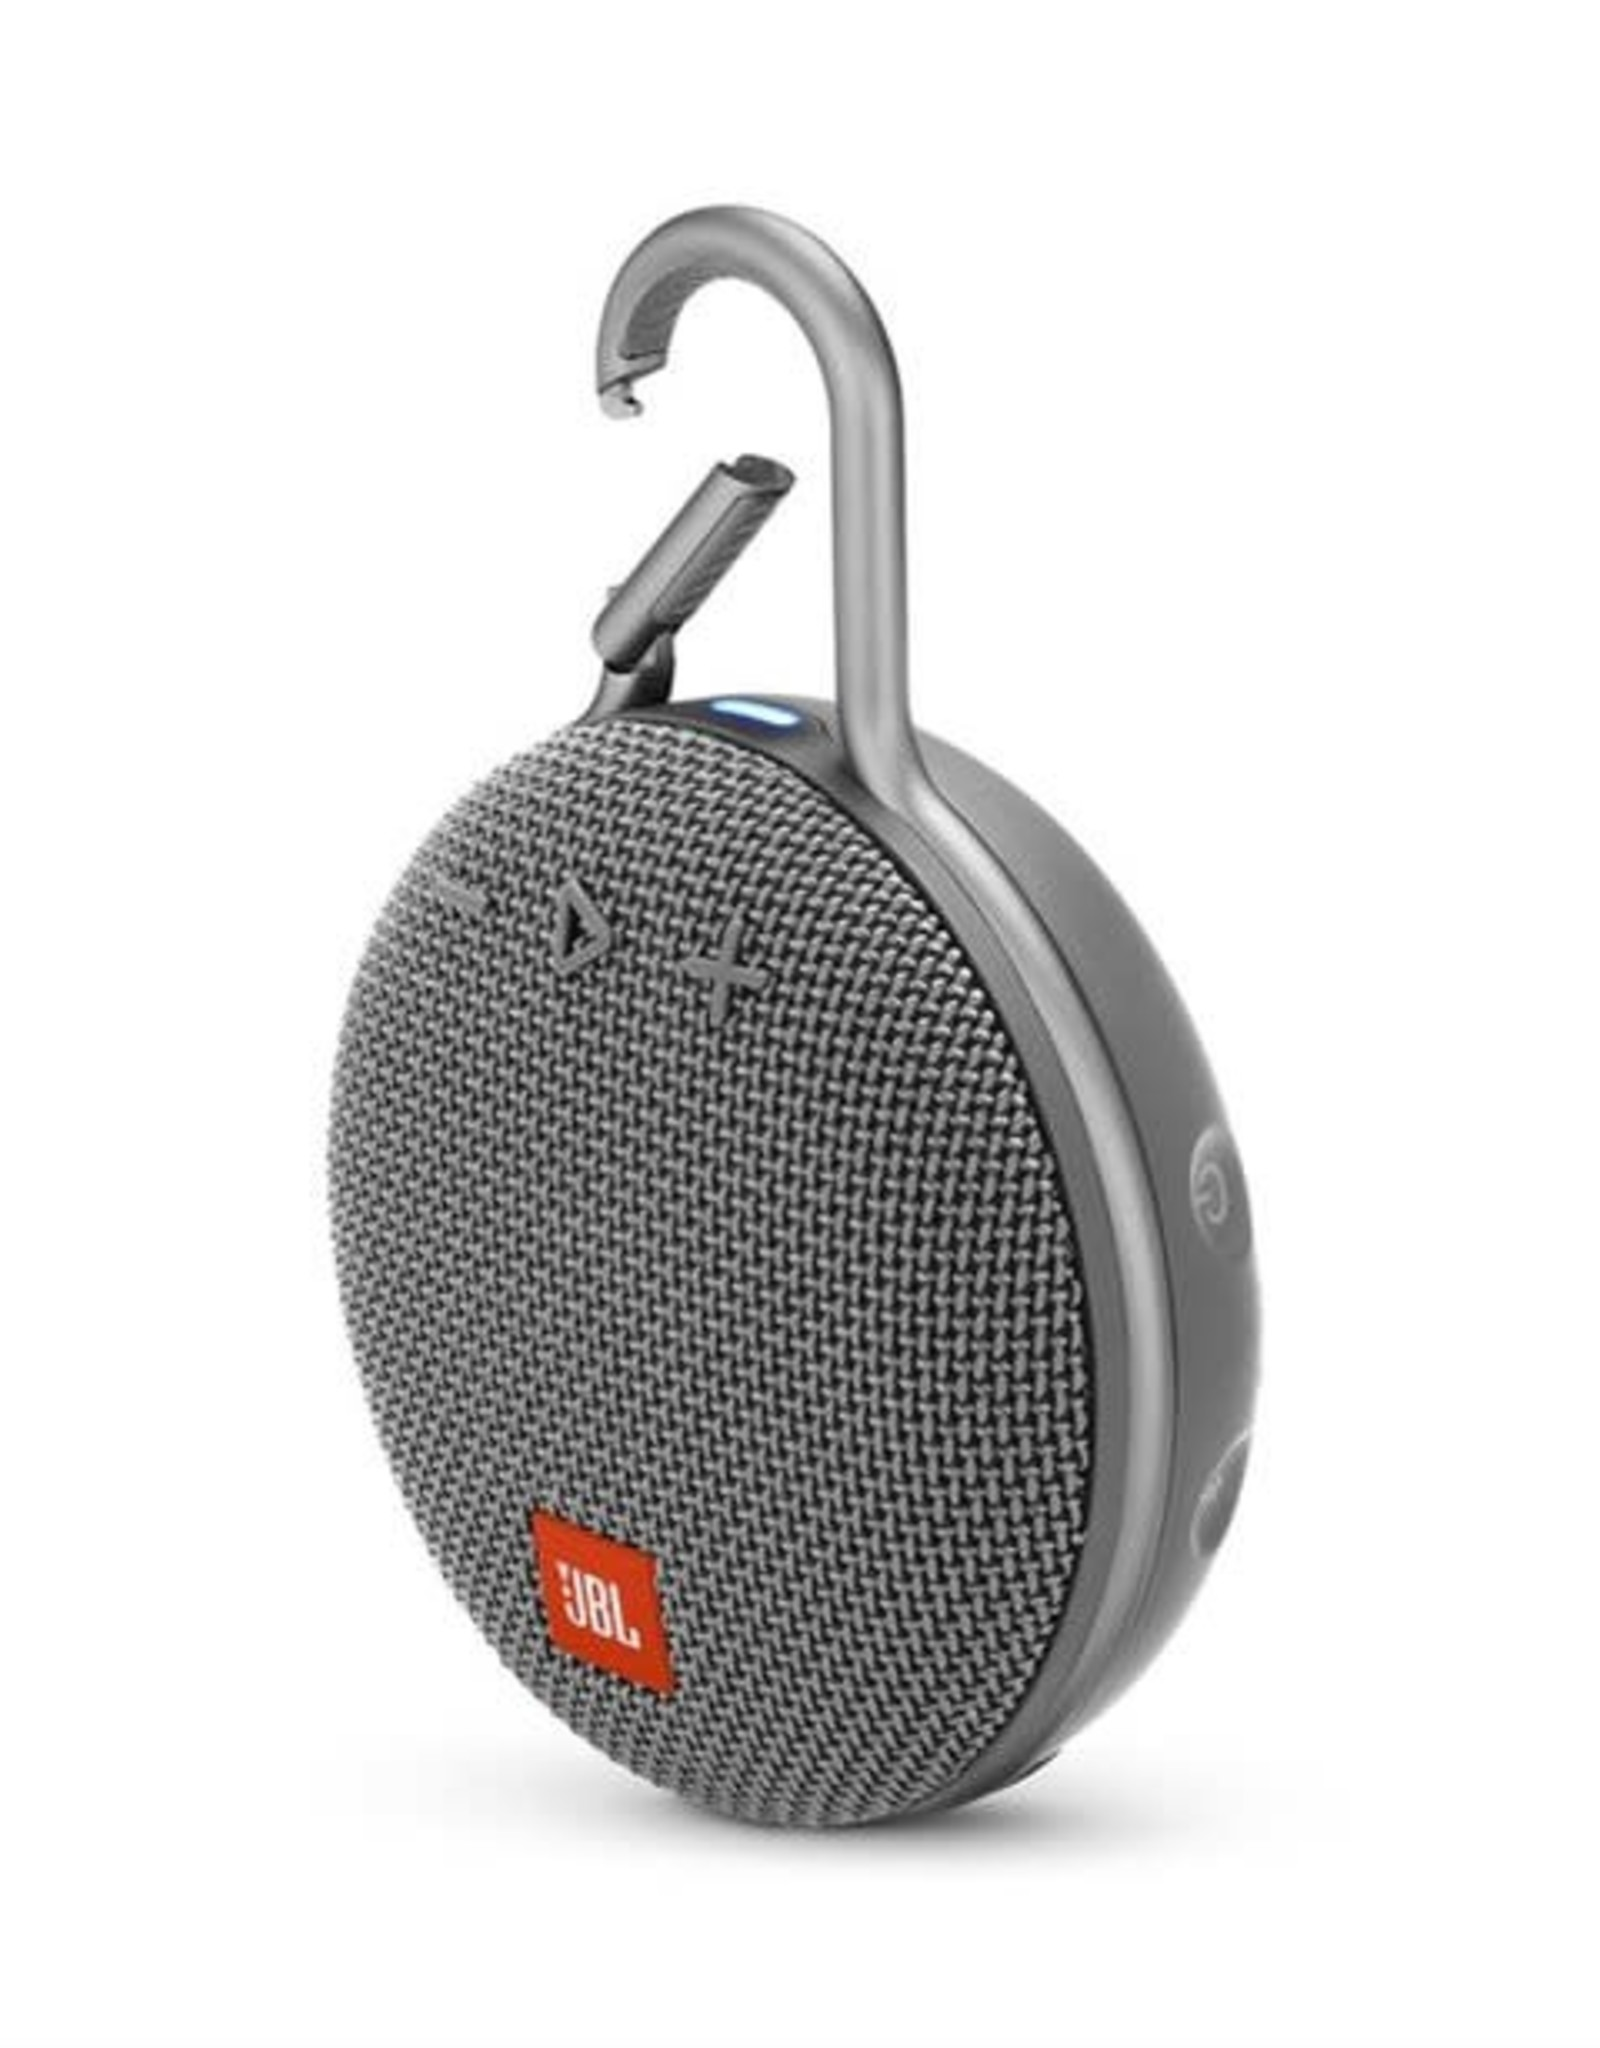 JBL JBL   CLIP 3 Portable BT Speaker Grey   JBLCLIP3GRYAM